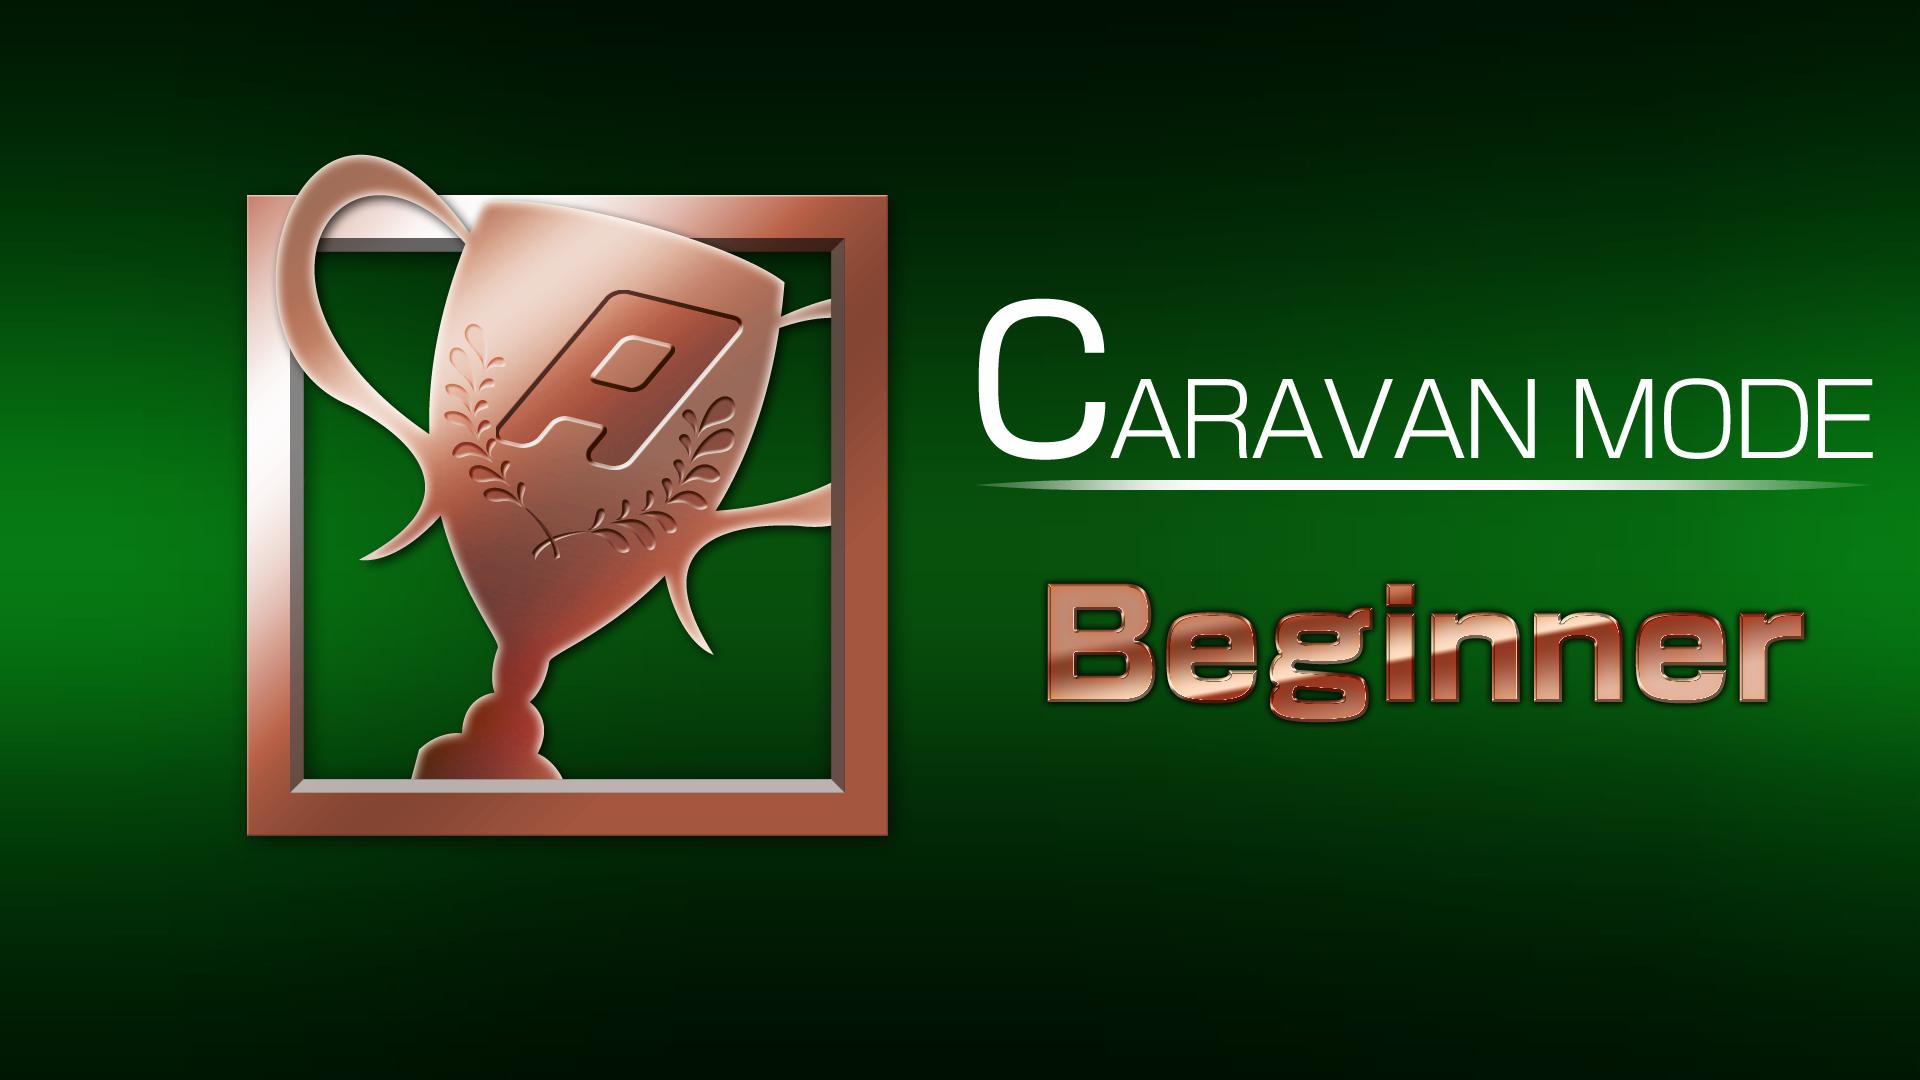 Icon for CARAVAN MODE 200 points